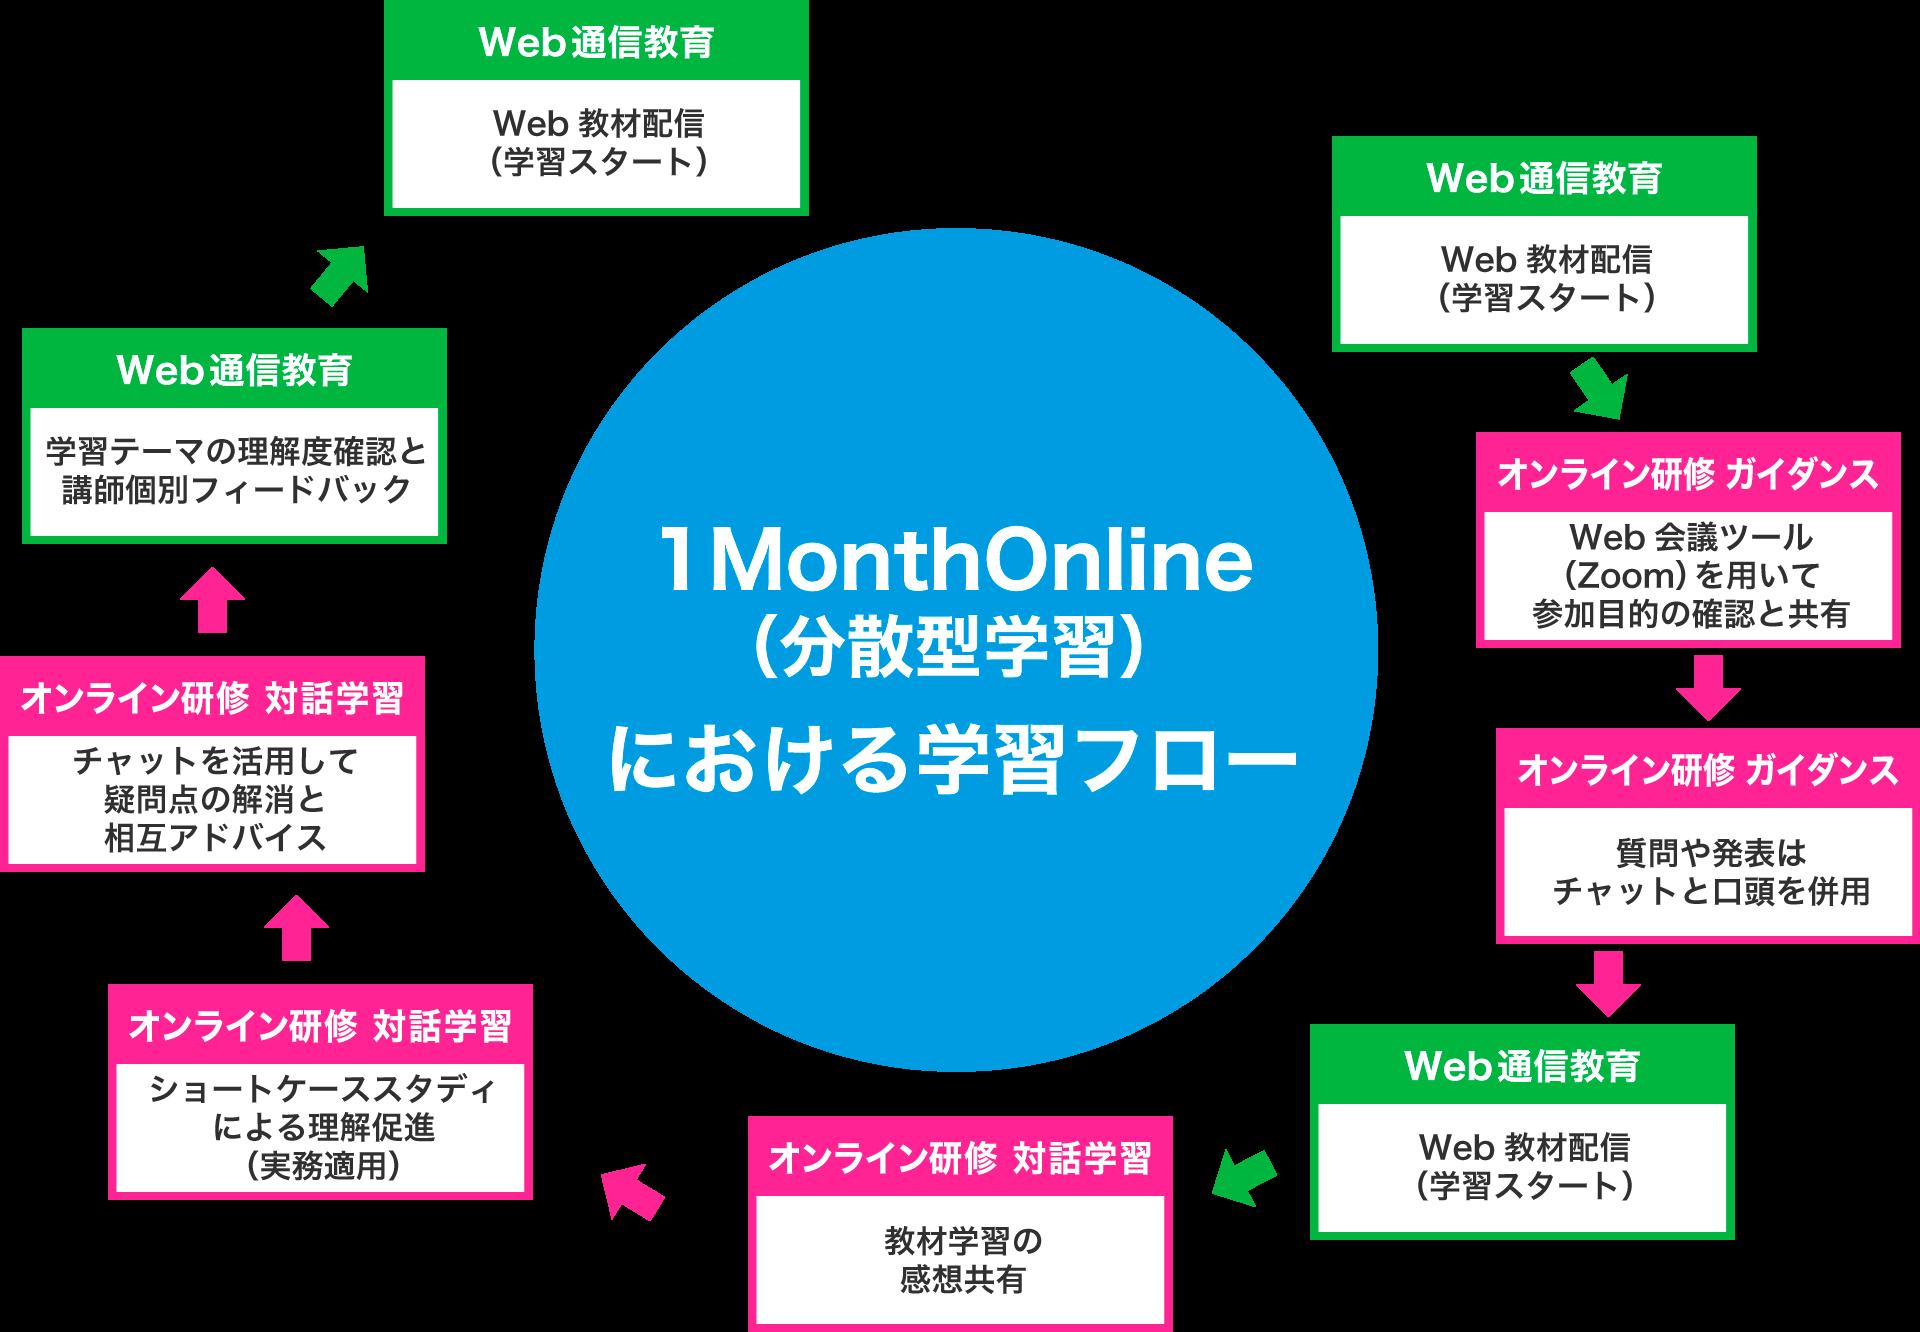 1MonthOnline(分散型学習)における学習フロー